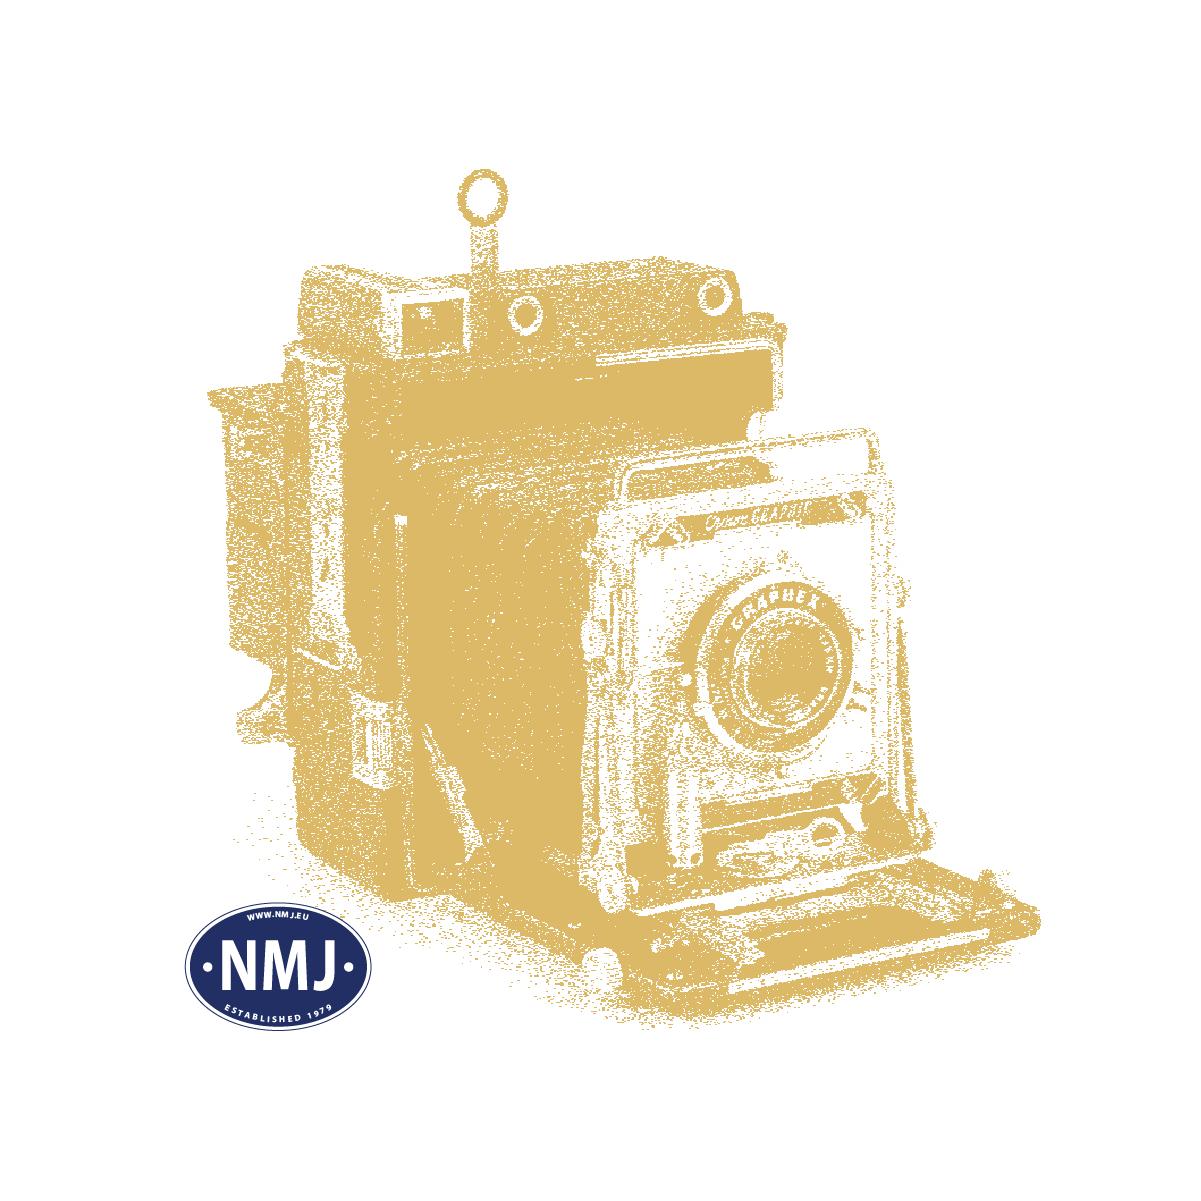 NMJT145002 - NMJ Topline NSB Di3a 622, Gammeldesign, 0-Skala